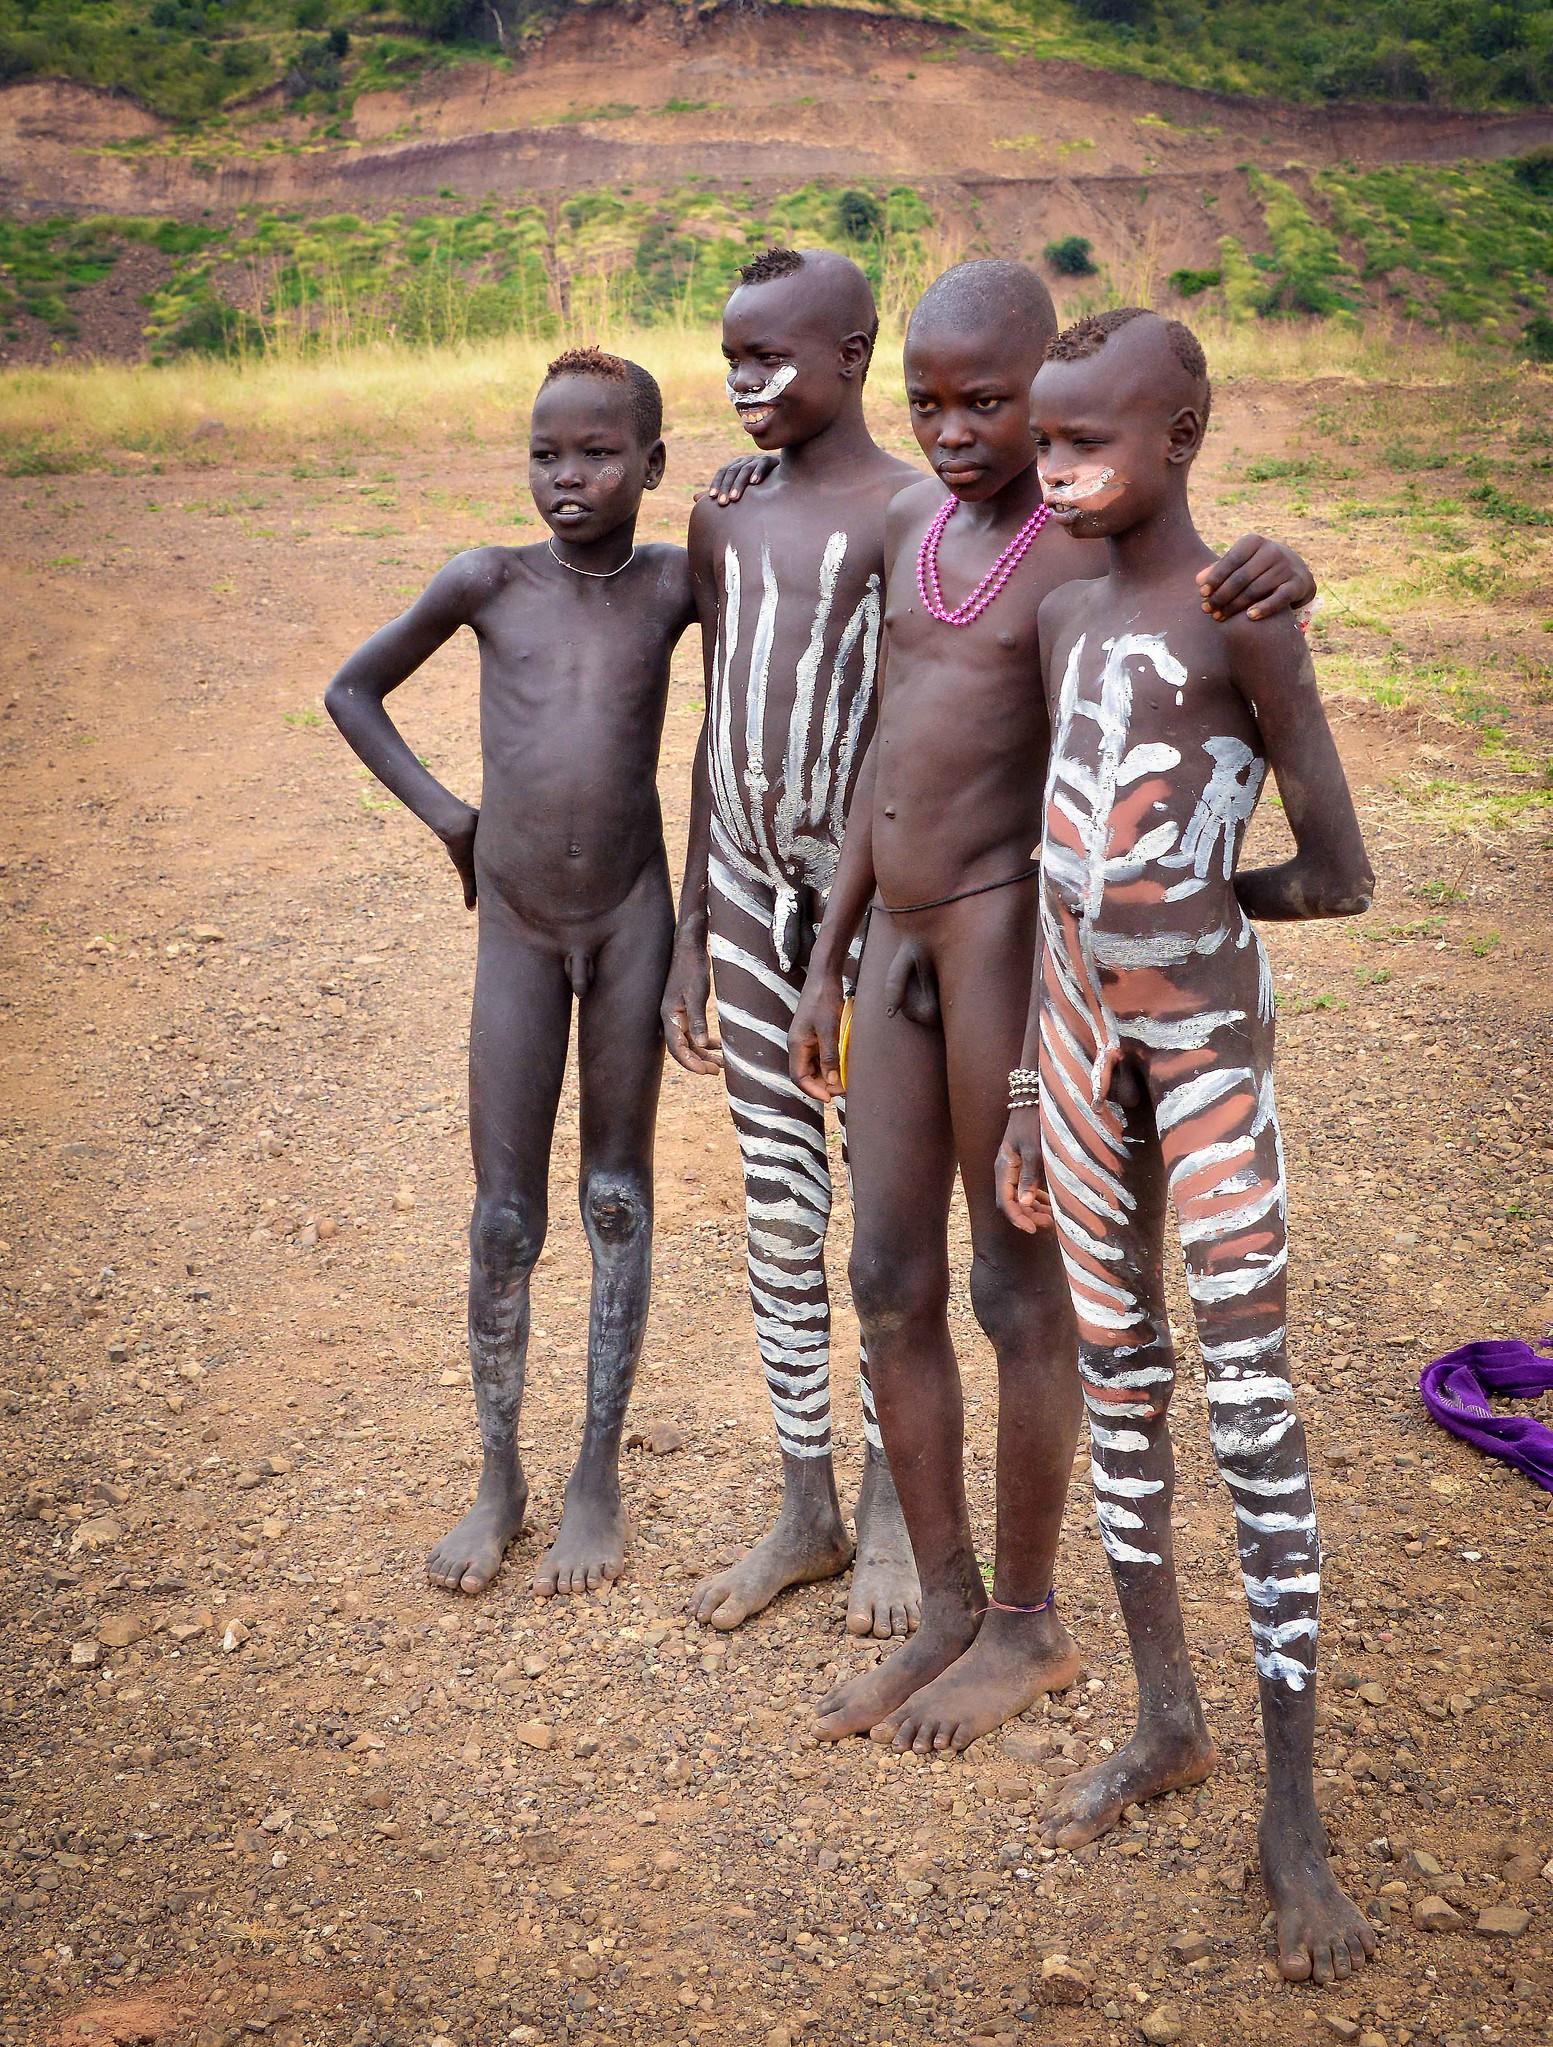 surma boys images - usseek.com